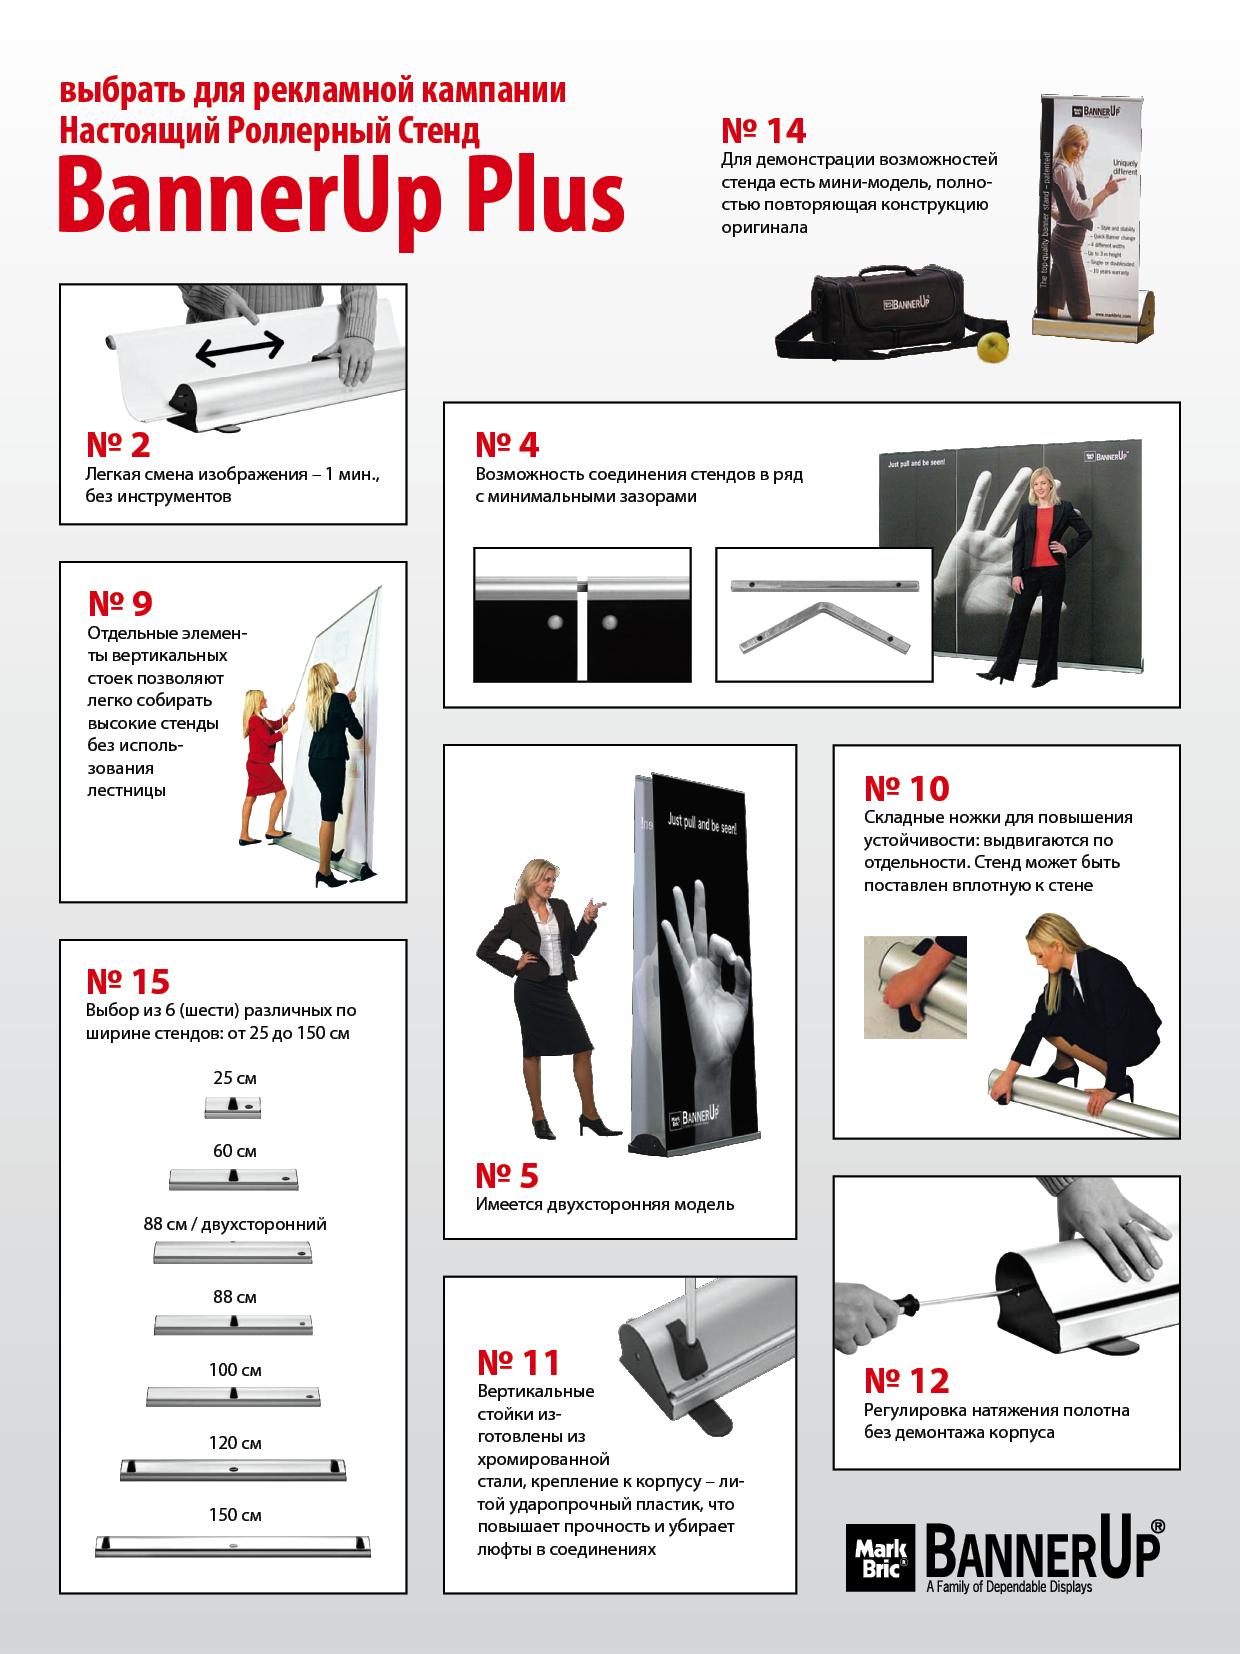 Схема сборки стендов BannerUp Plus